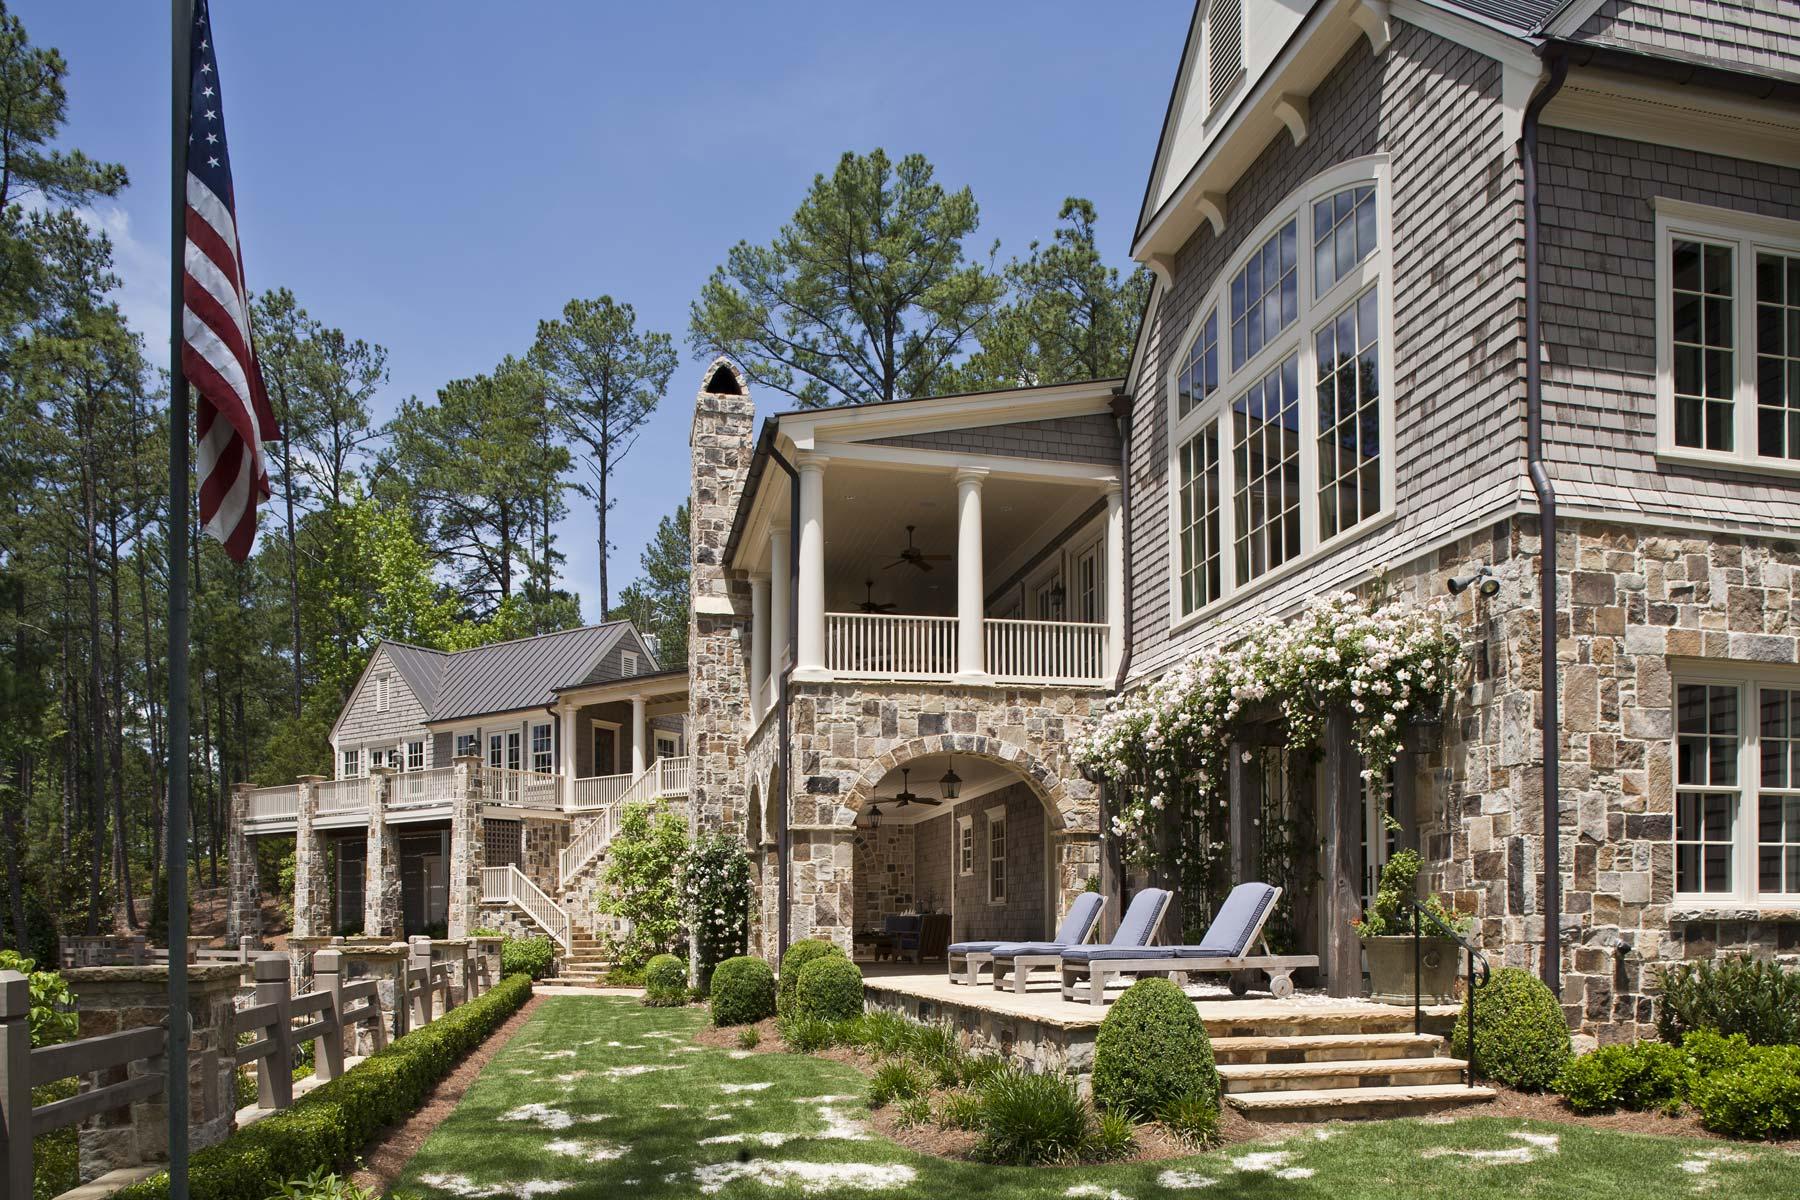 South Carolina Lake House Rear Exterior